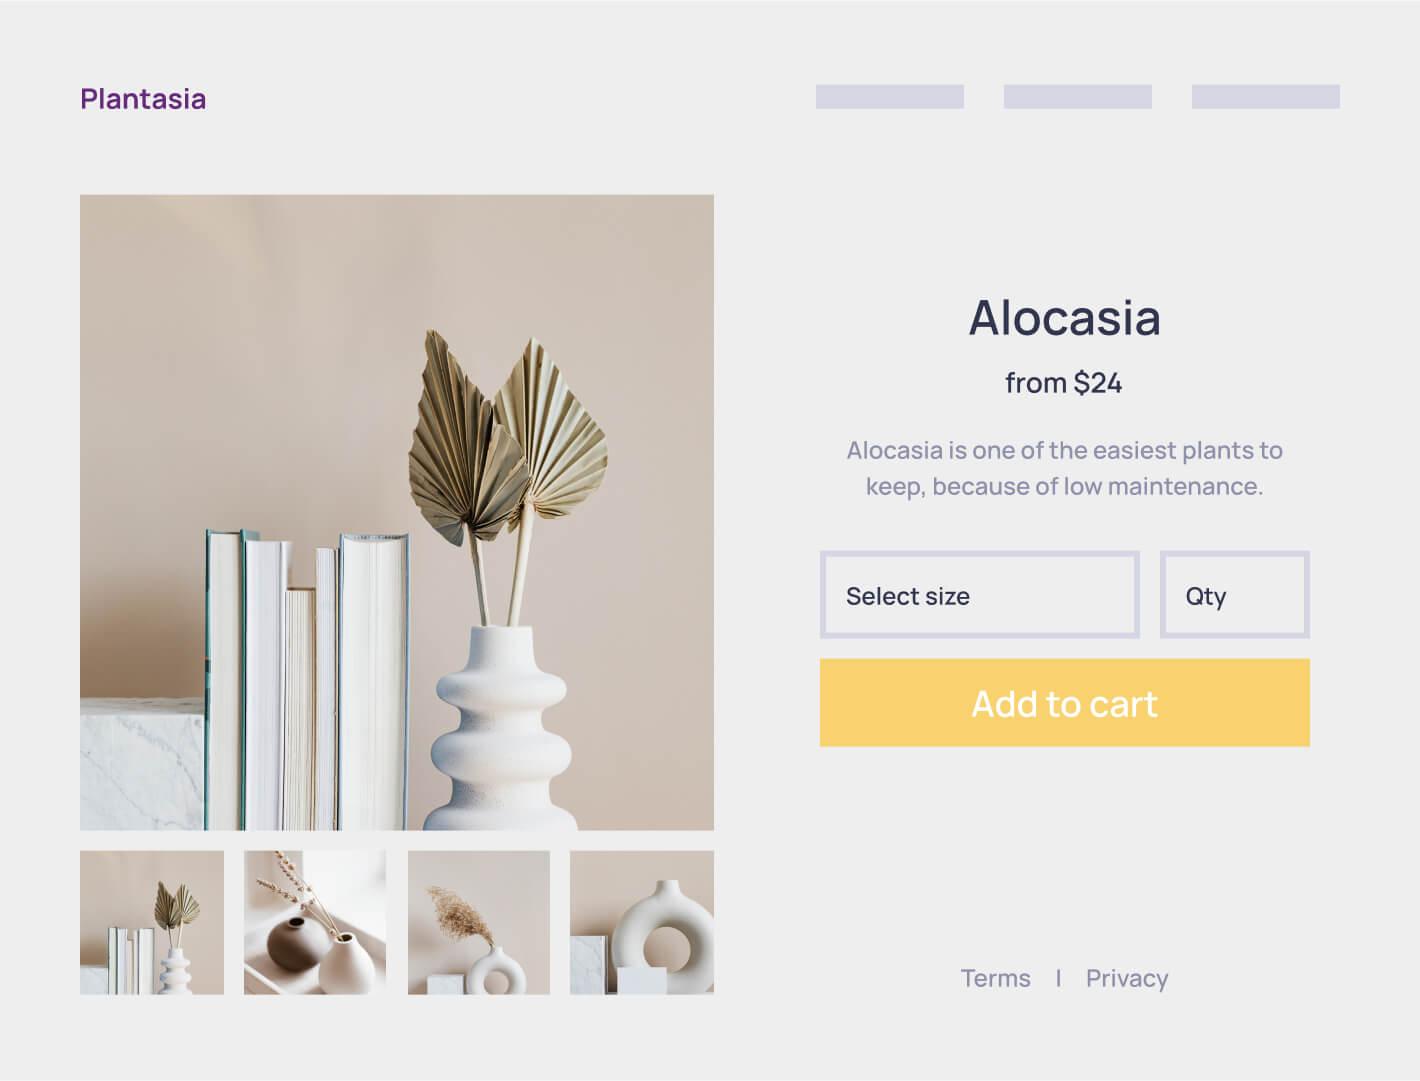 Browser mockup of an e-commerce website